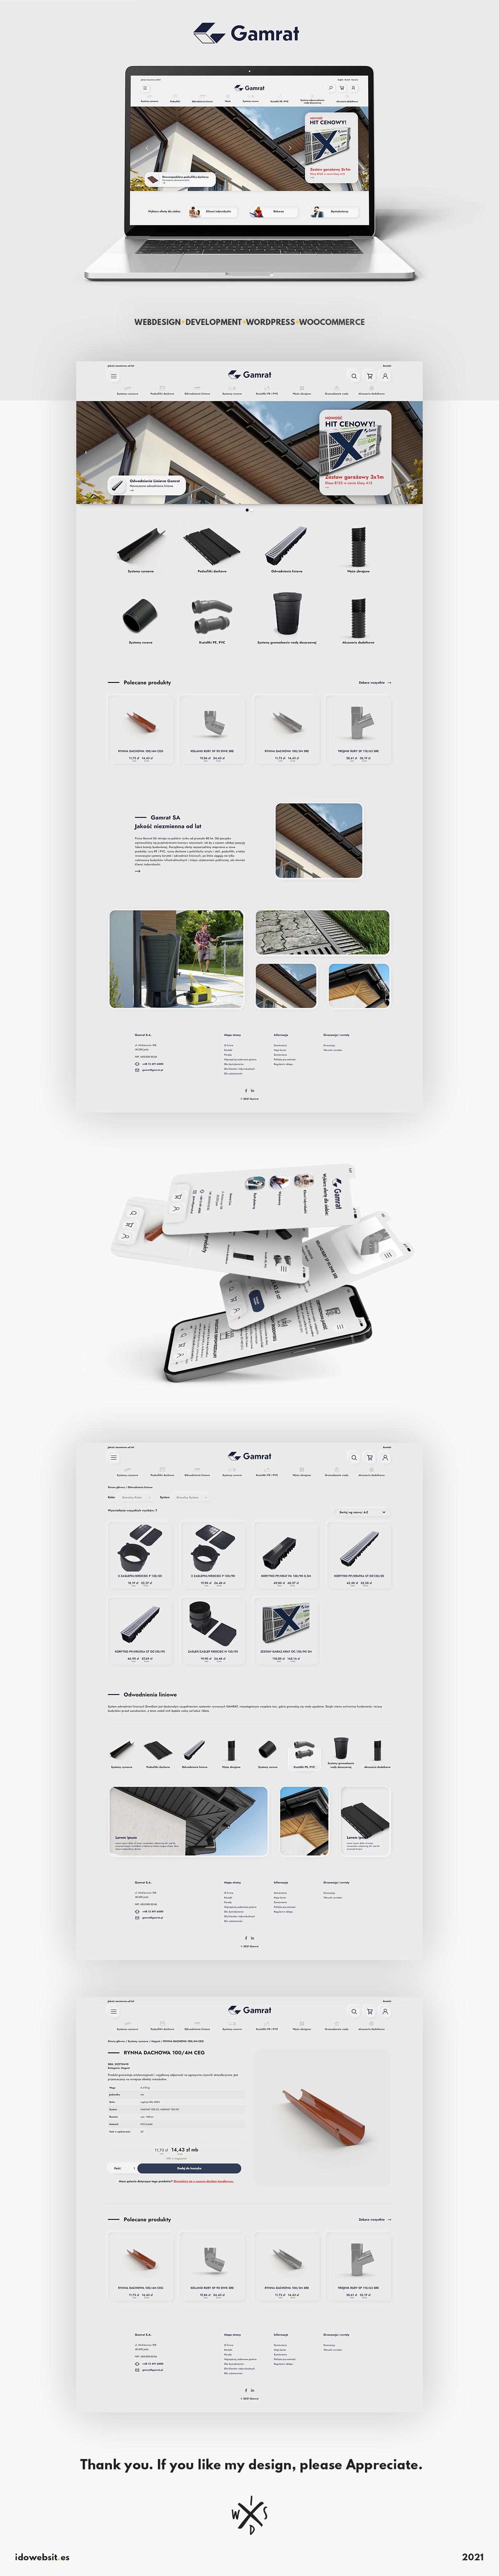 light wordpress theme sklep woocommerce ui design Web Design  Webdesign website layout woocommerce layout wordpress theme design